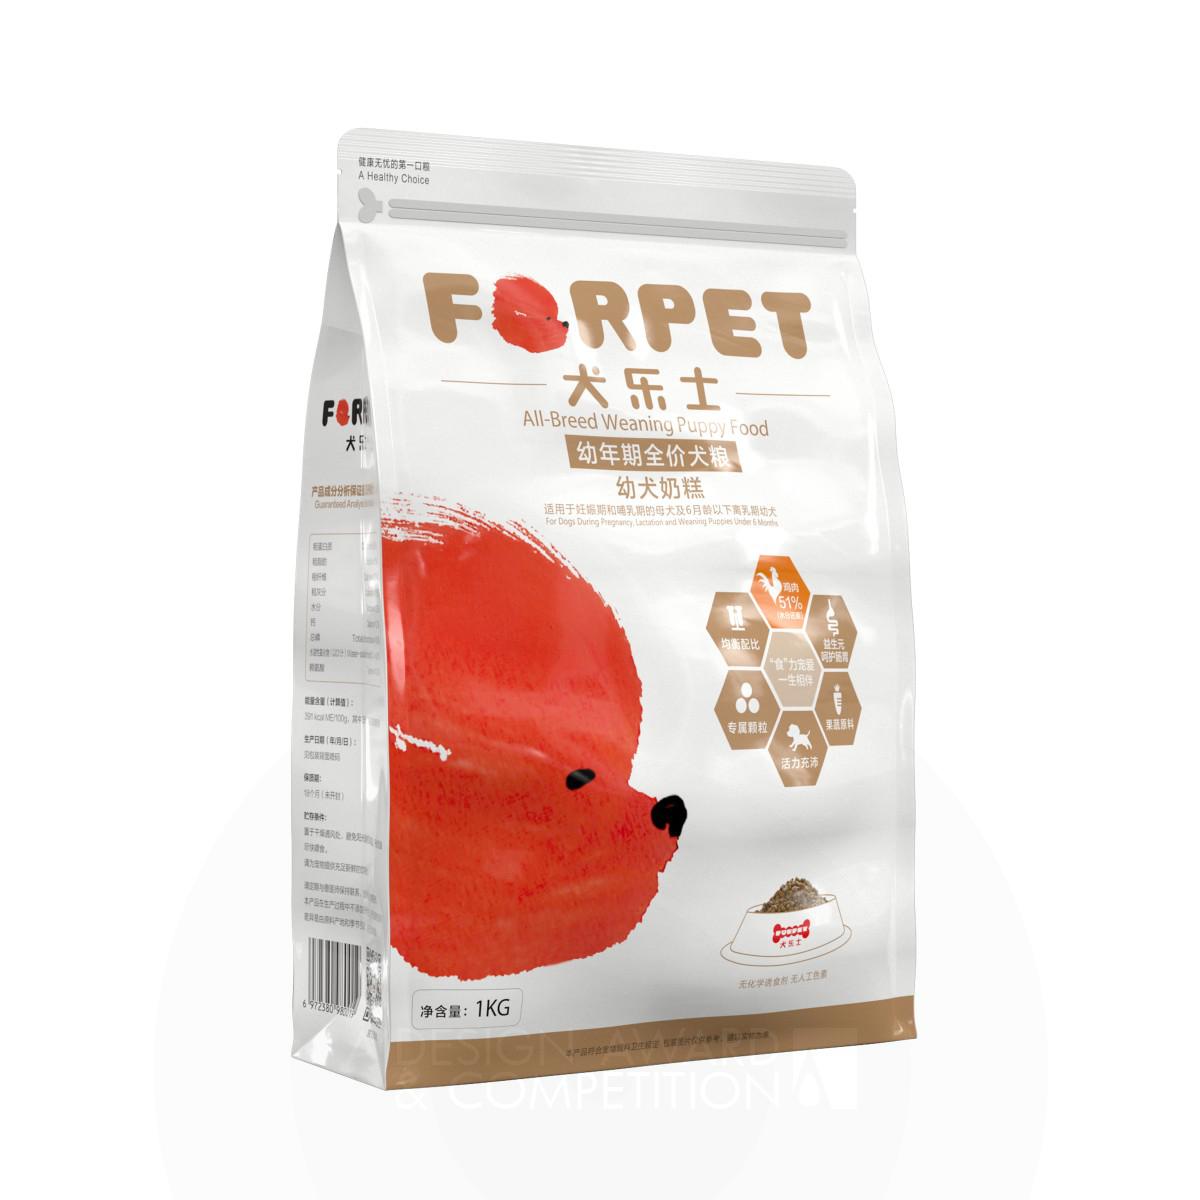 Forpet Dog Food Packaging